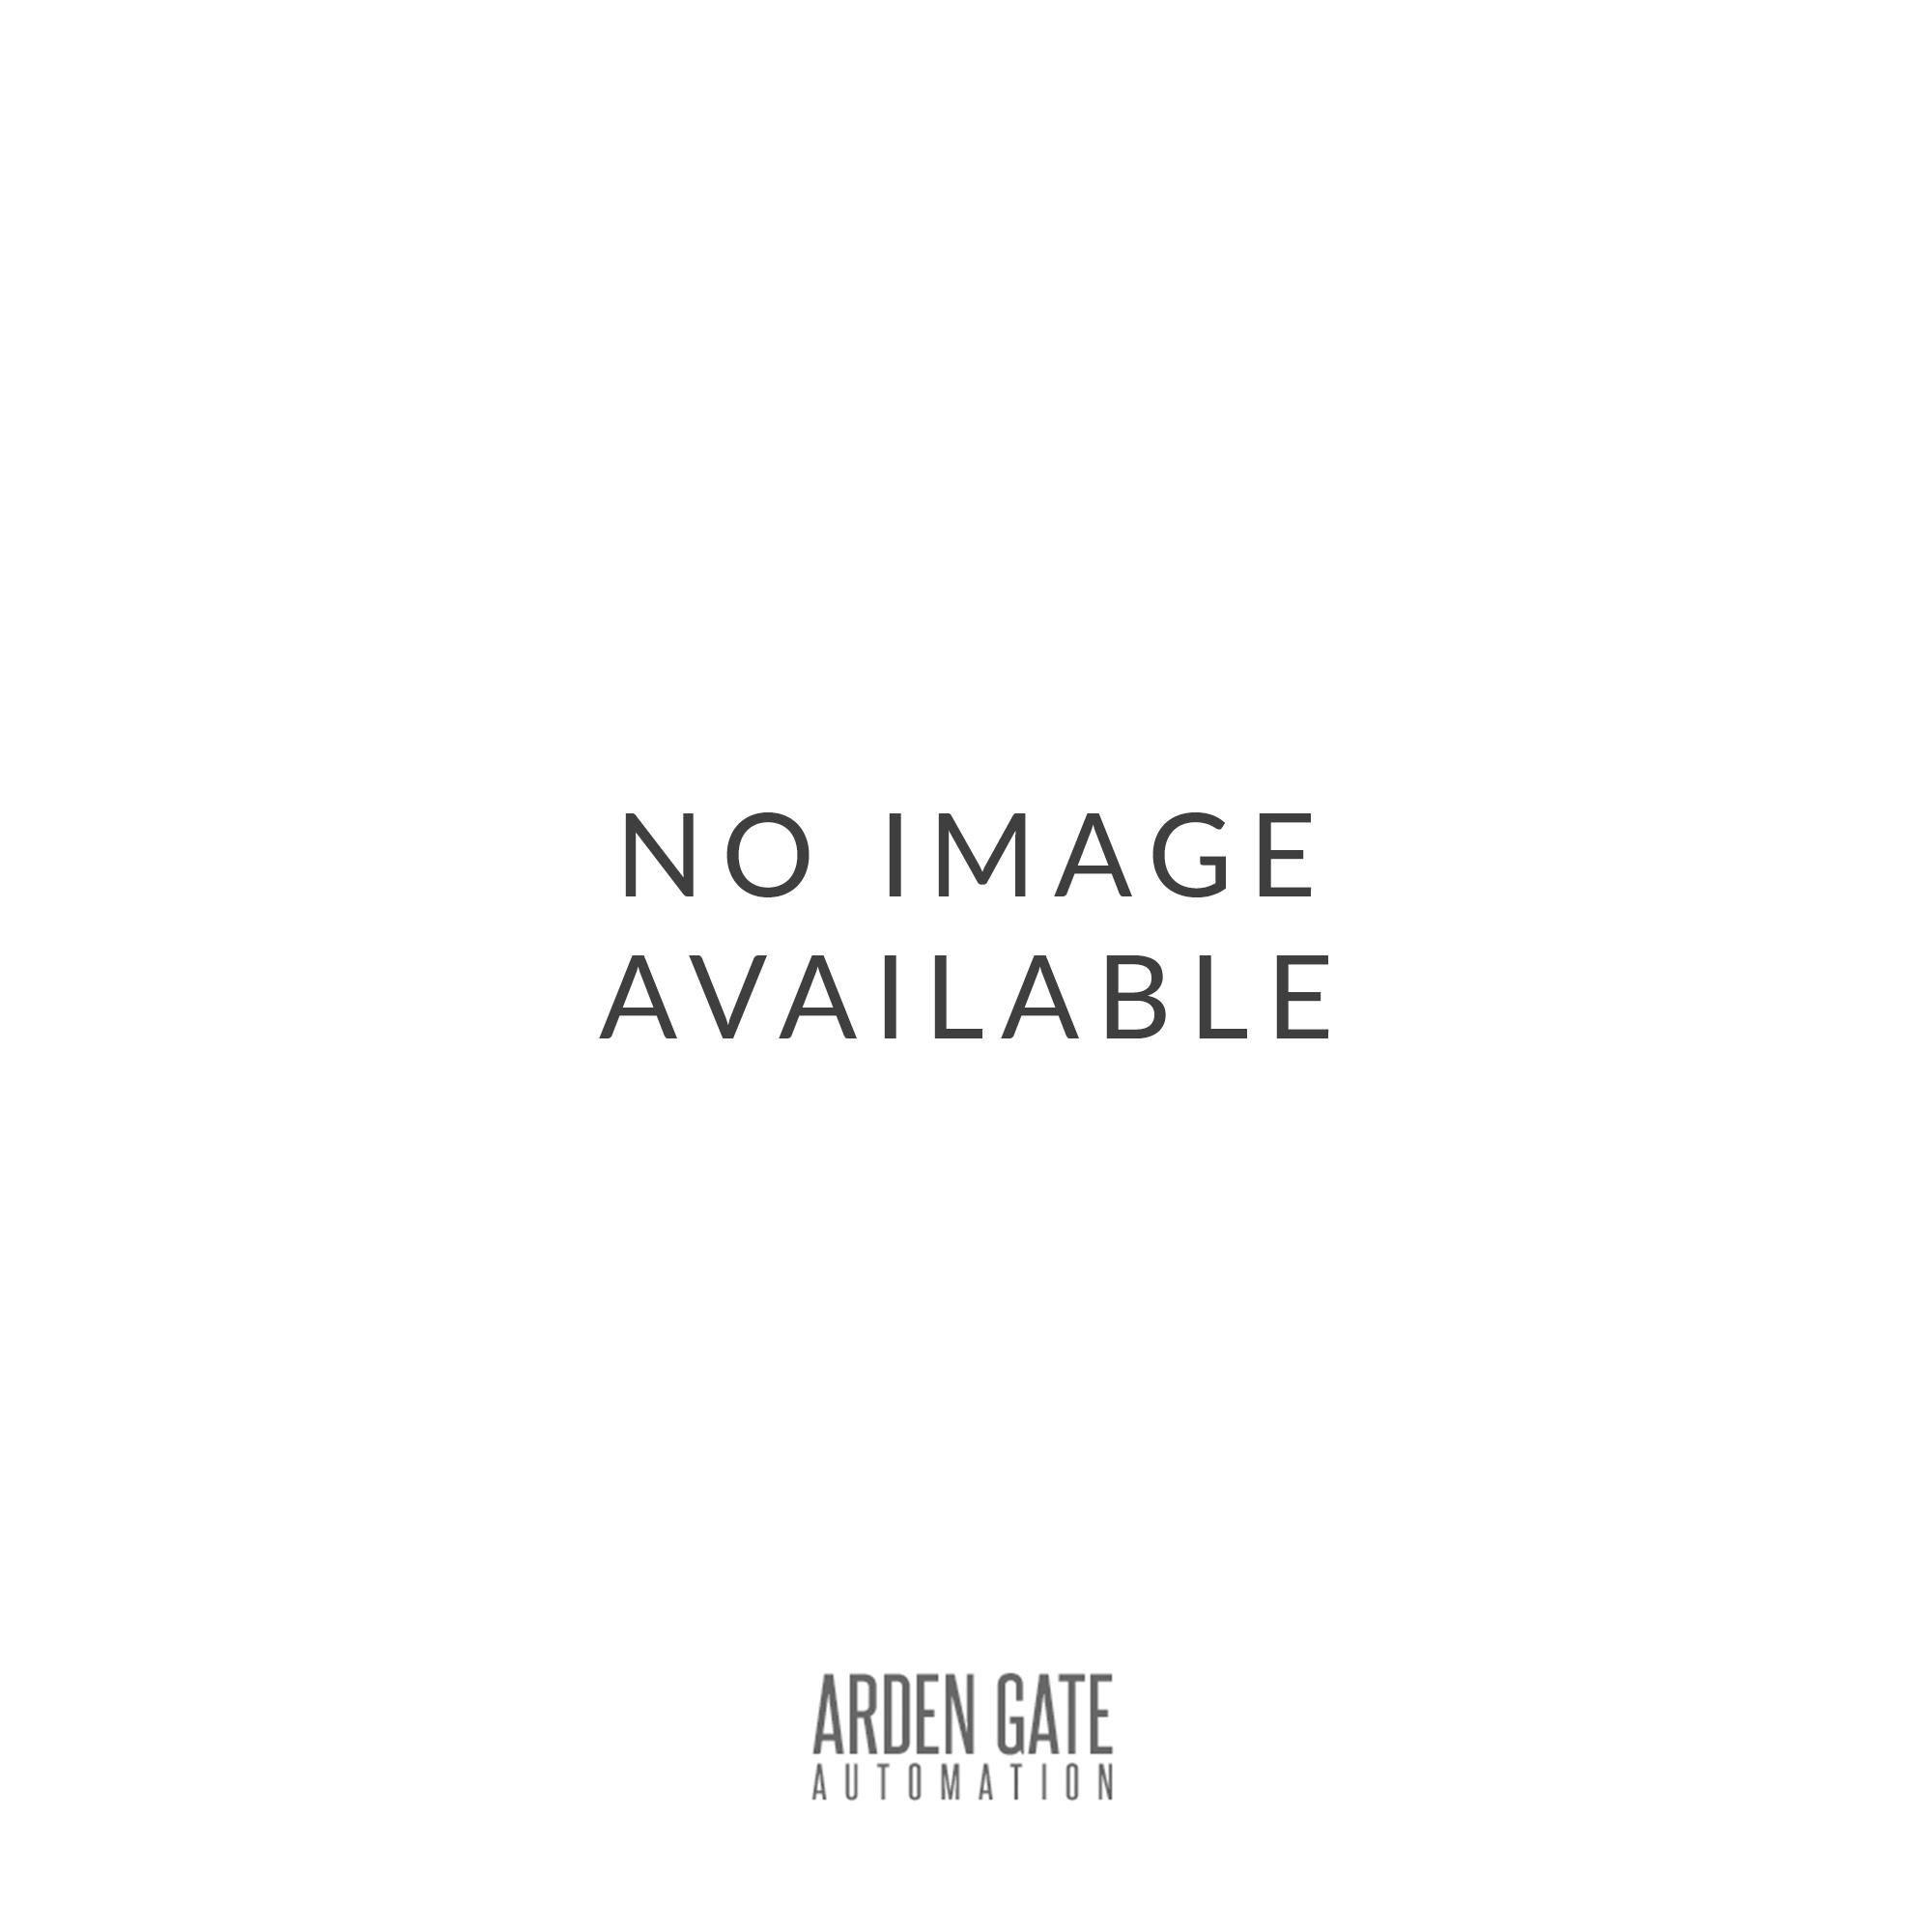 CDVI 2 Channel Transmitter, Rolling Code